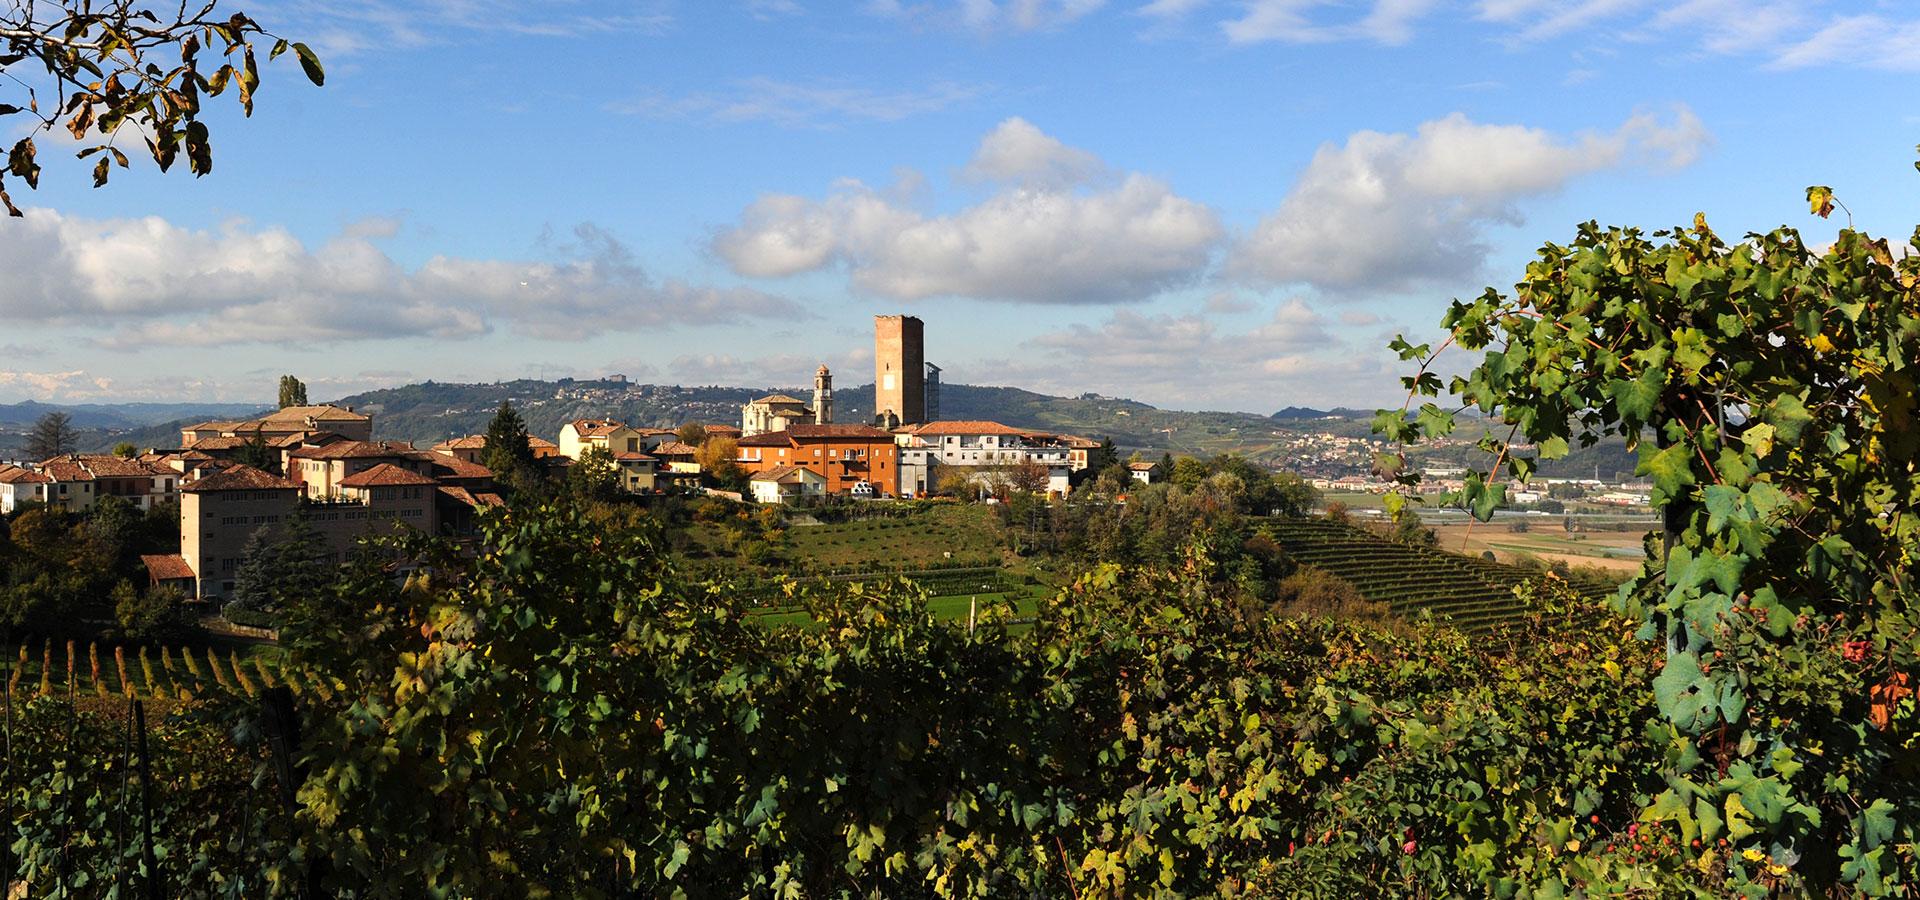 Torre-di-barbaresco-3